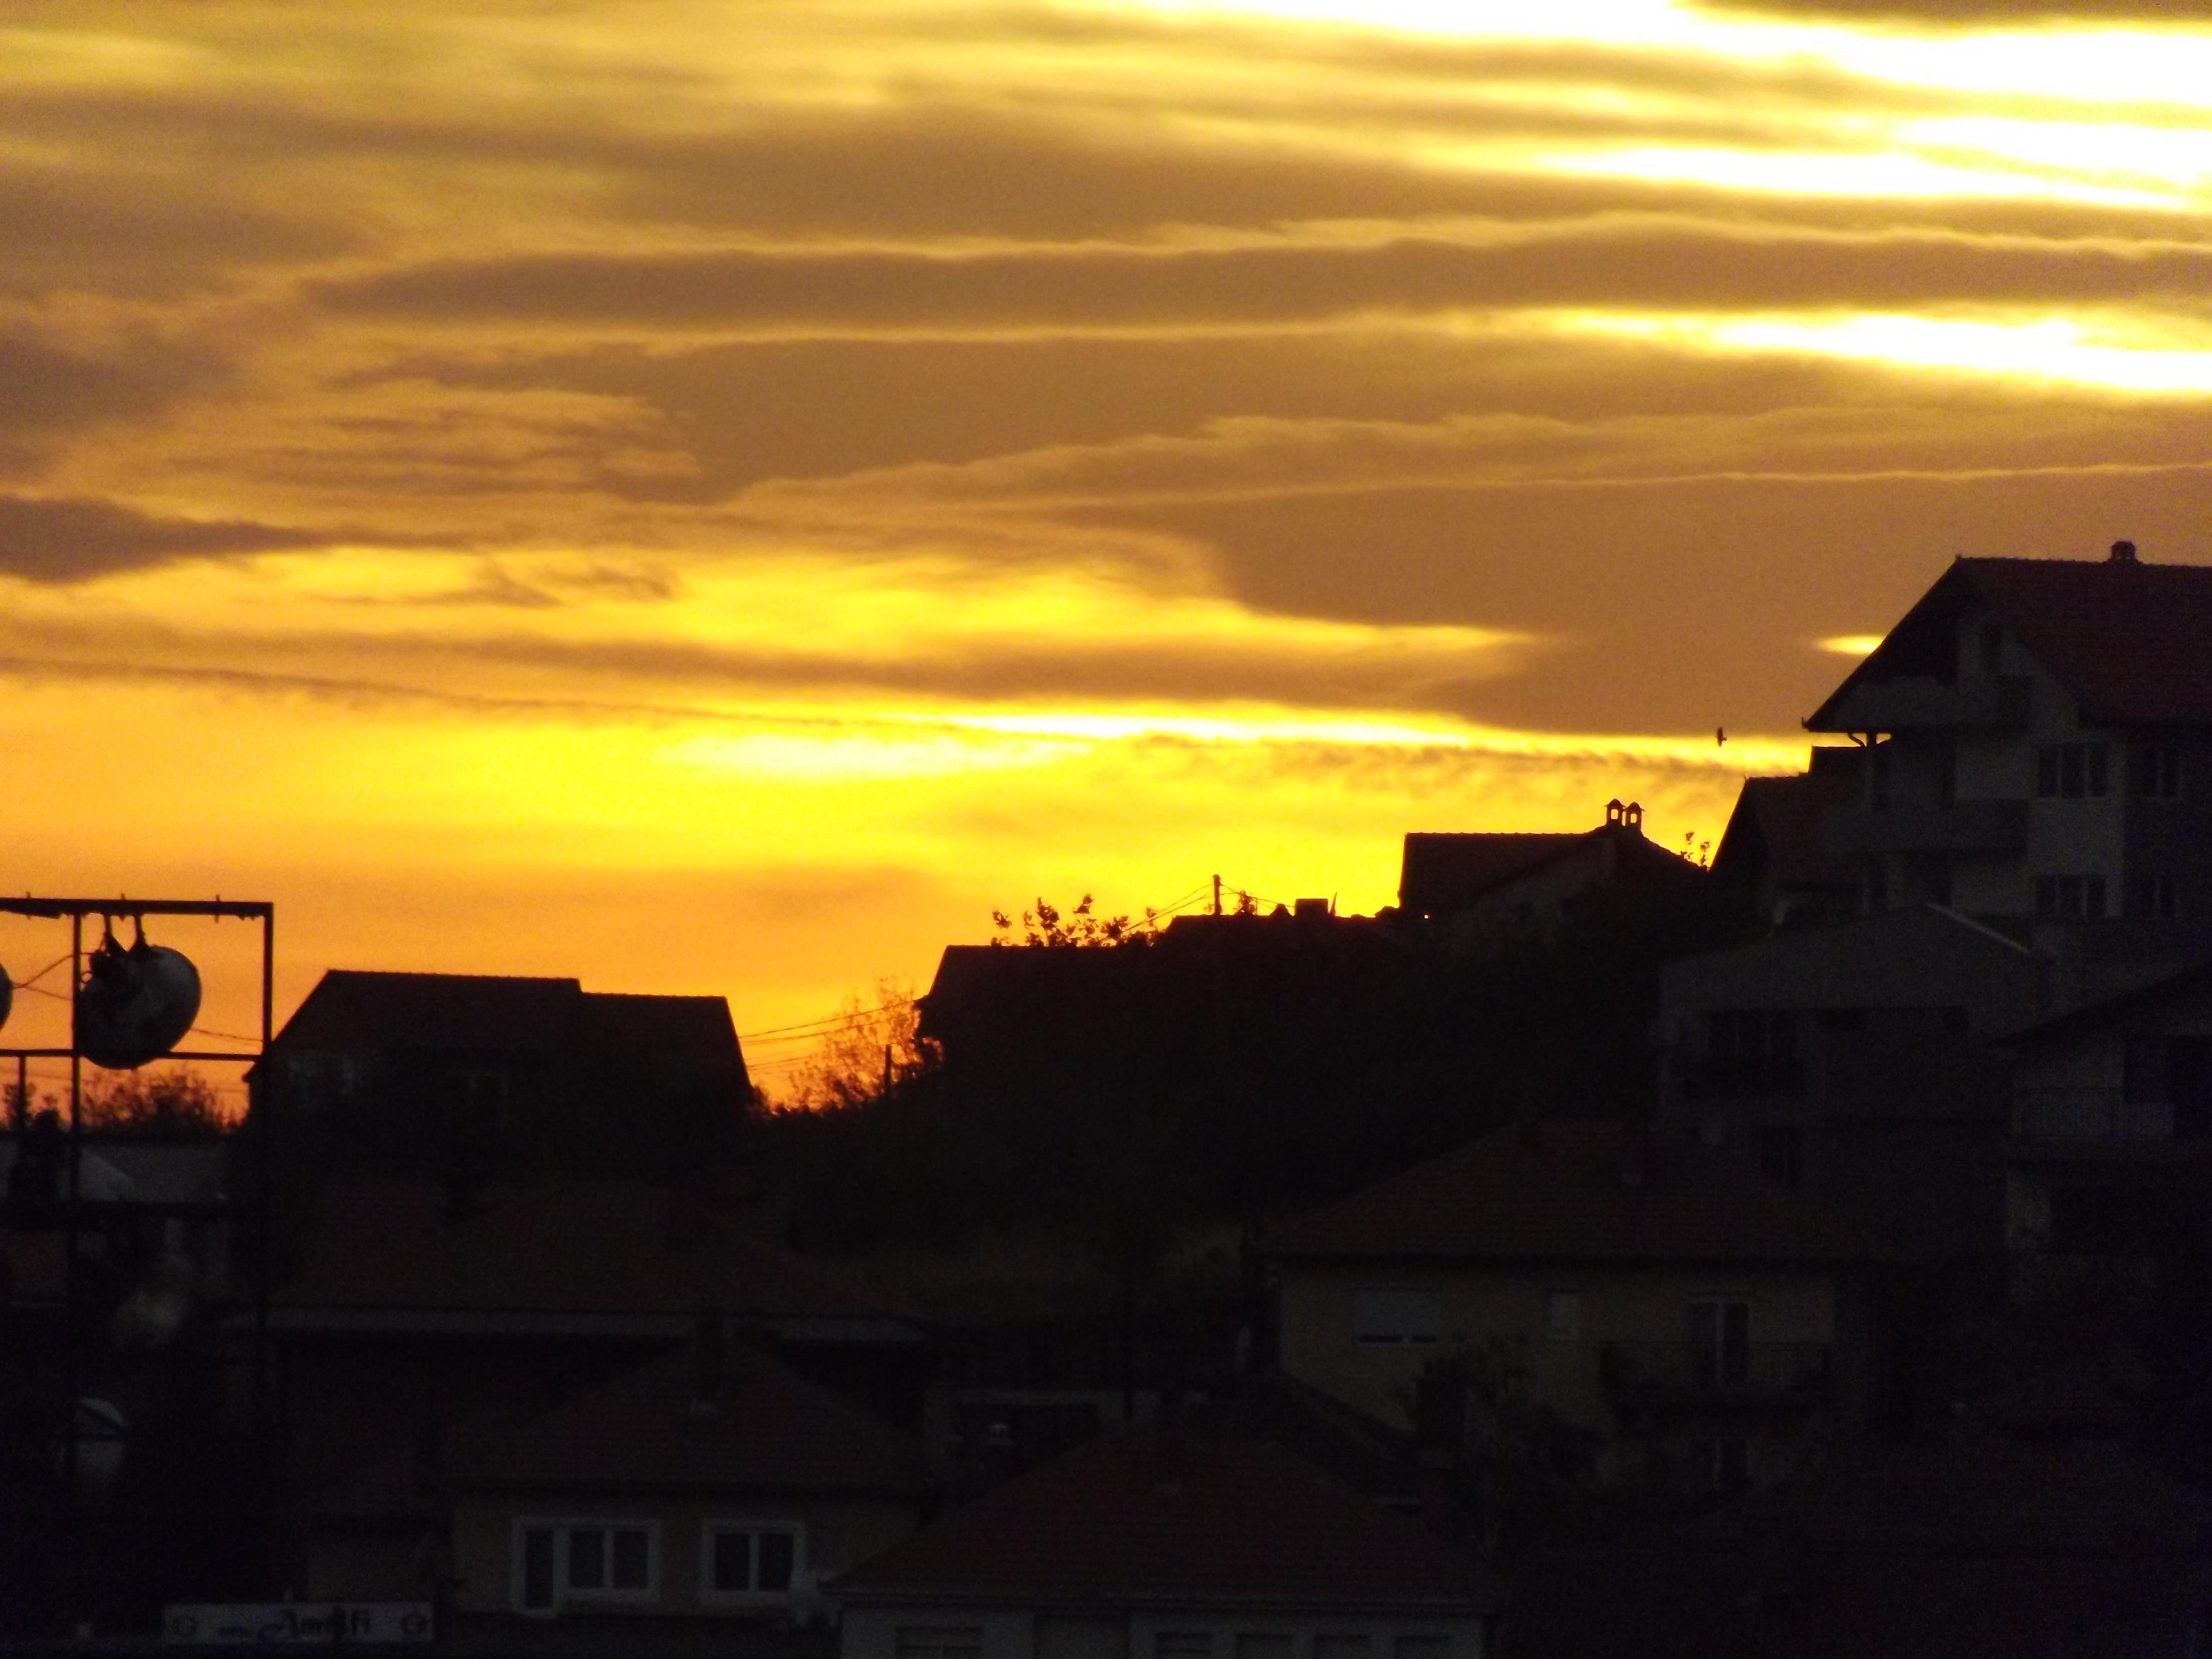 File:Perendimi i diellit ne Prishtine.JPG - Wikimedia Commons   title   perendimi i diellit